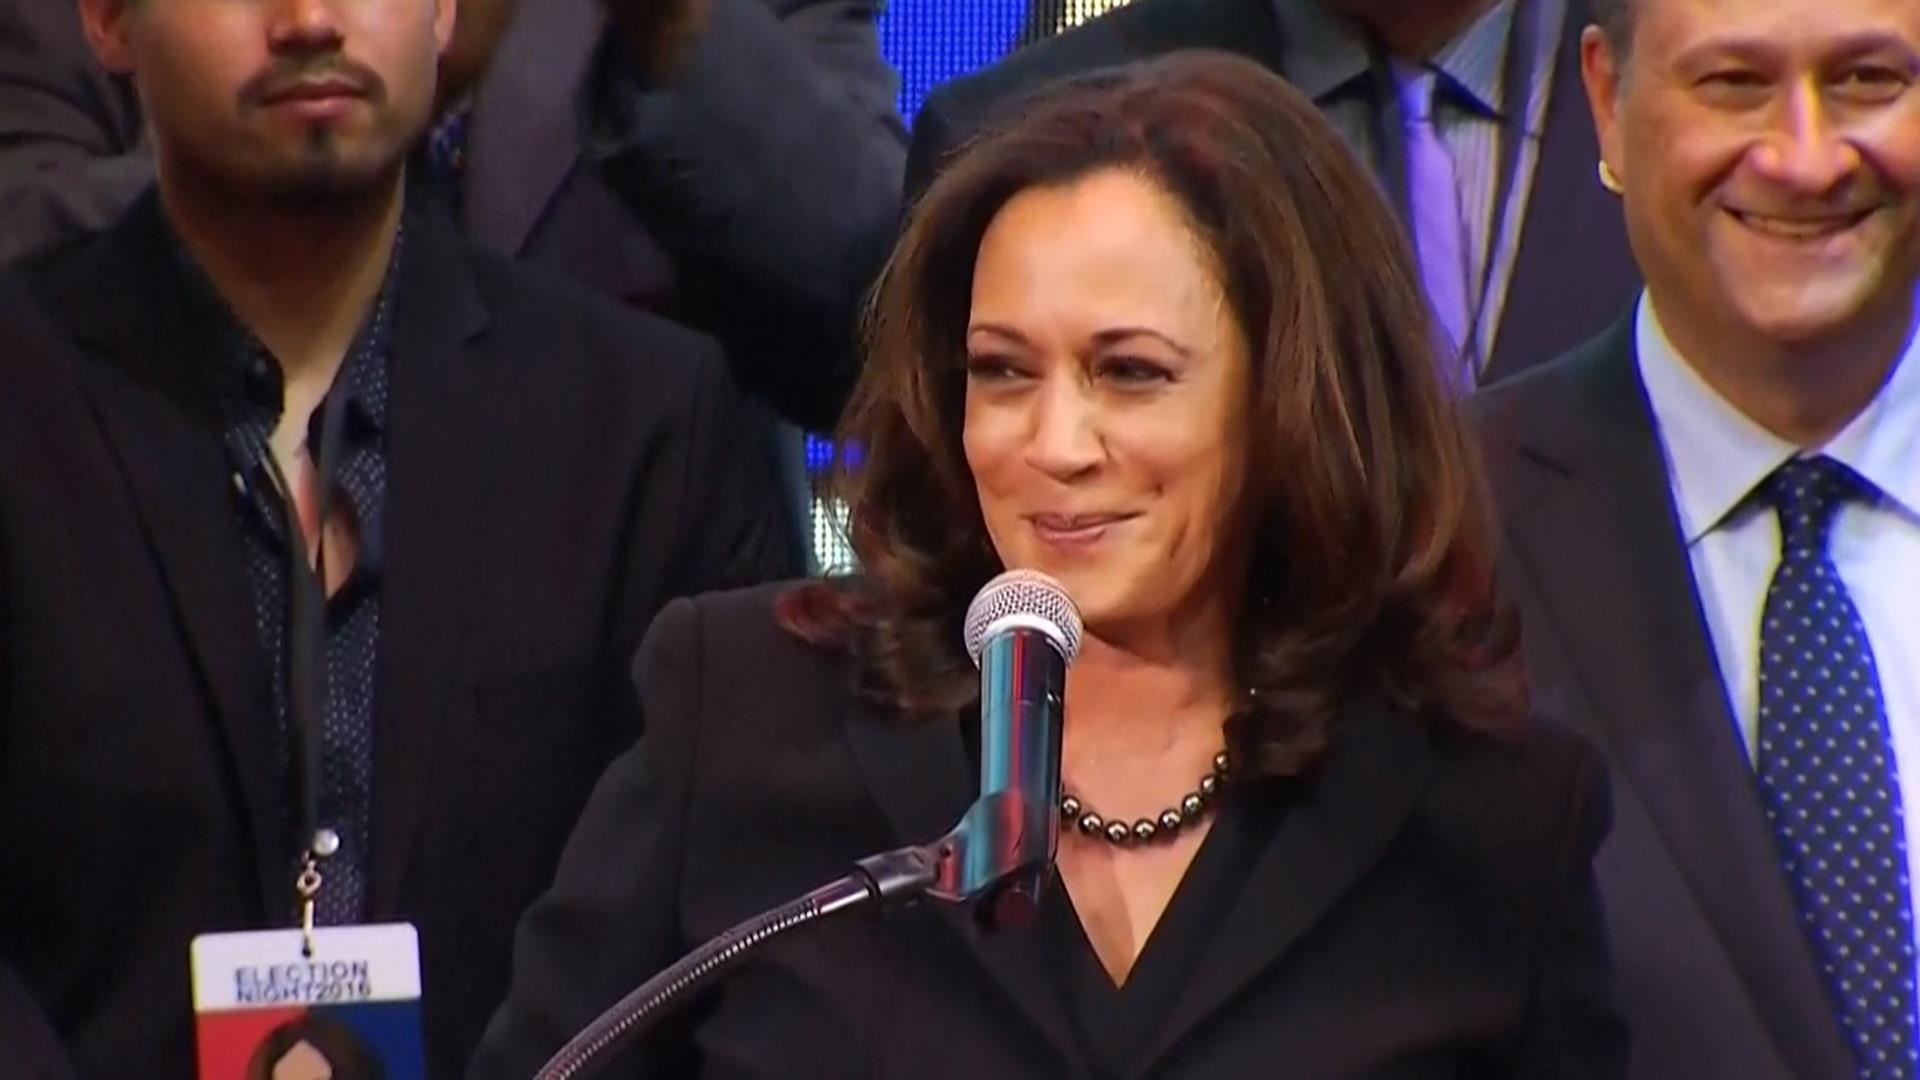 See California Senator Elect Kamala Harris Victory Speech